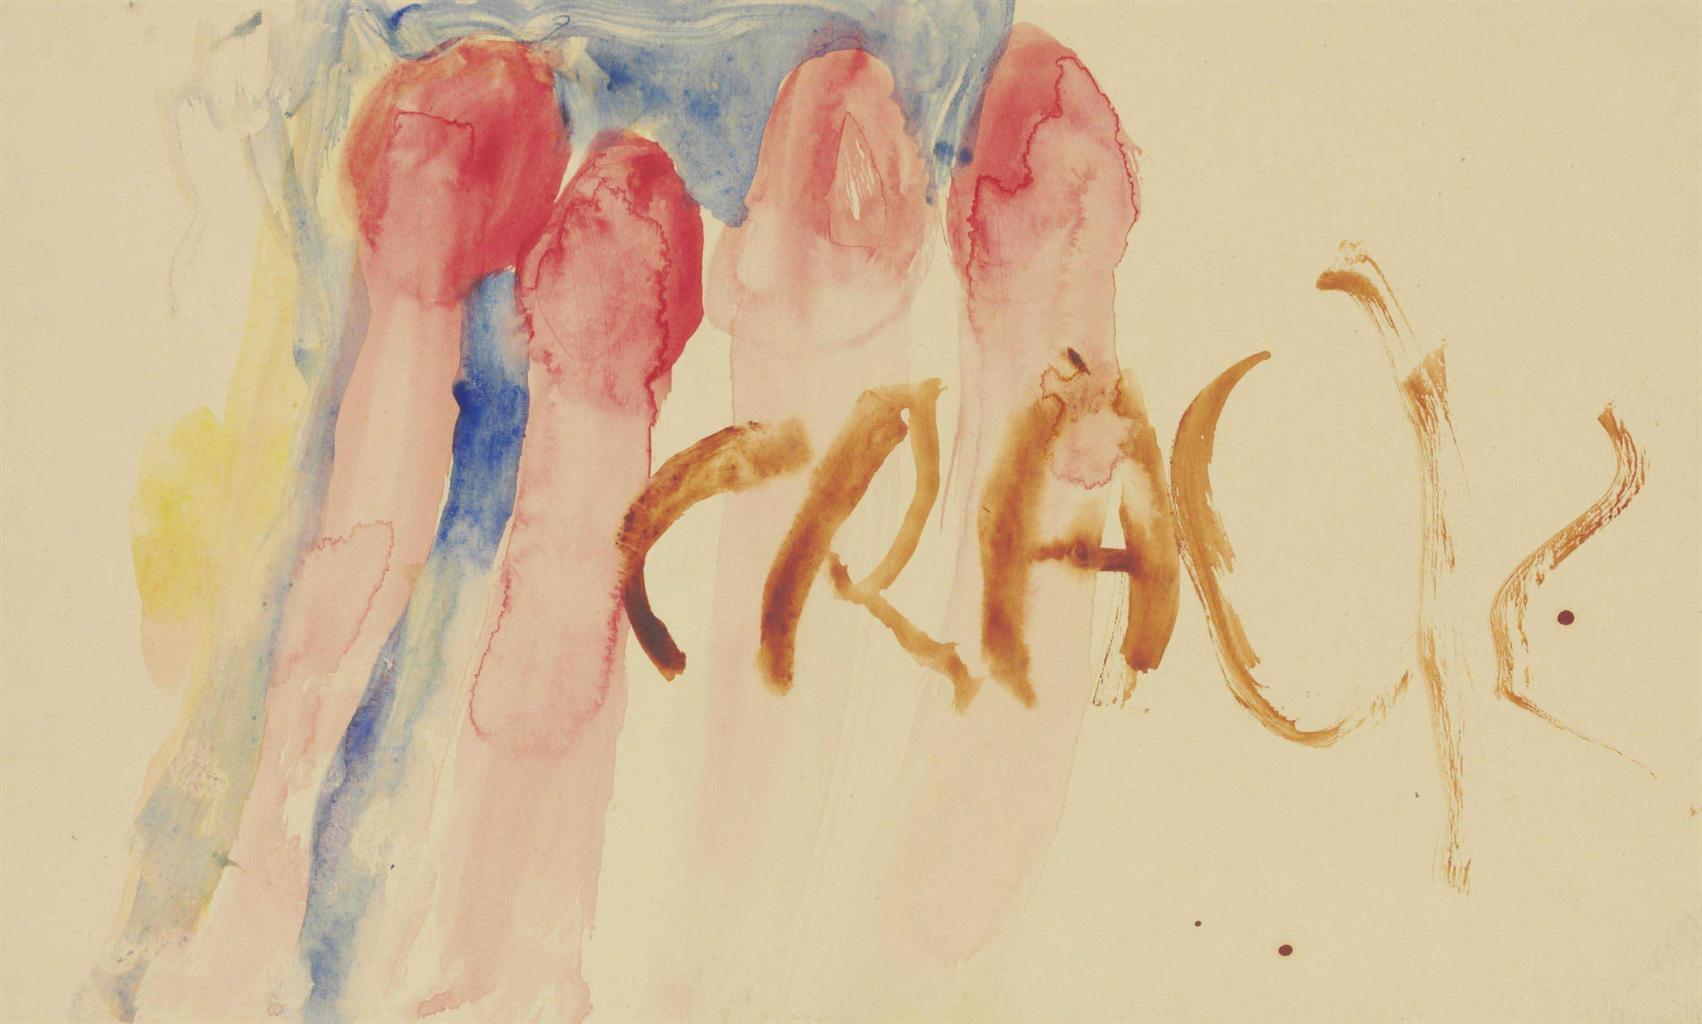 Jim Dine-Crack-1964